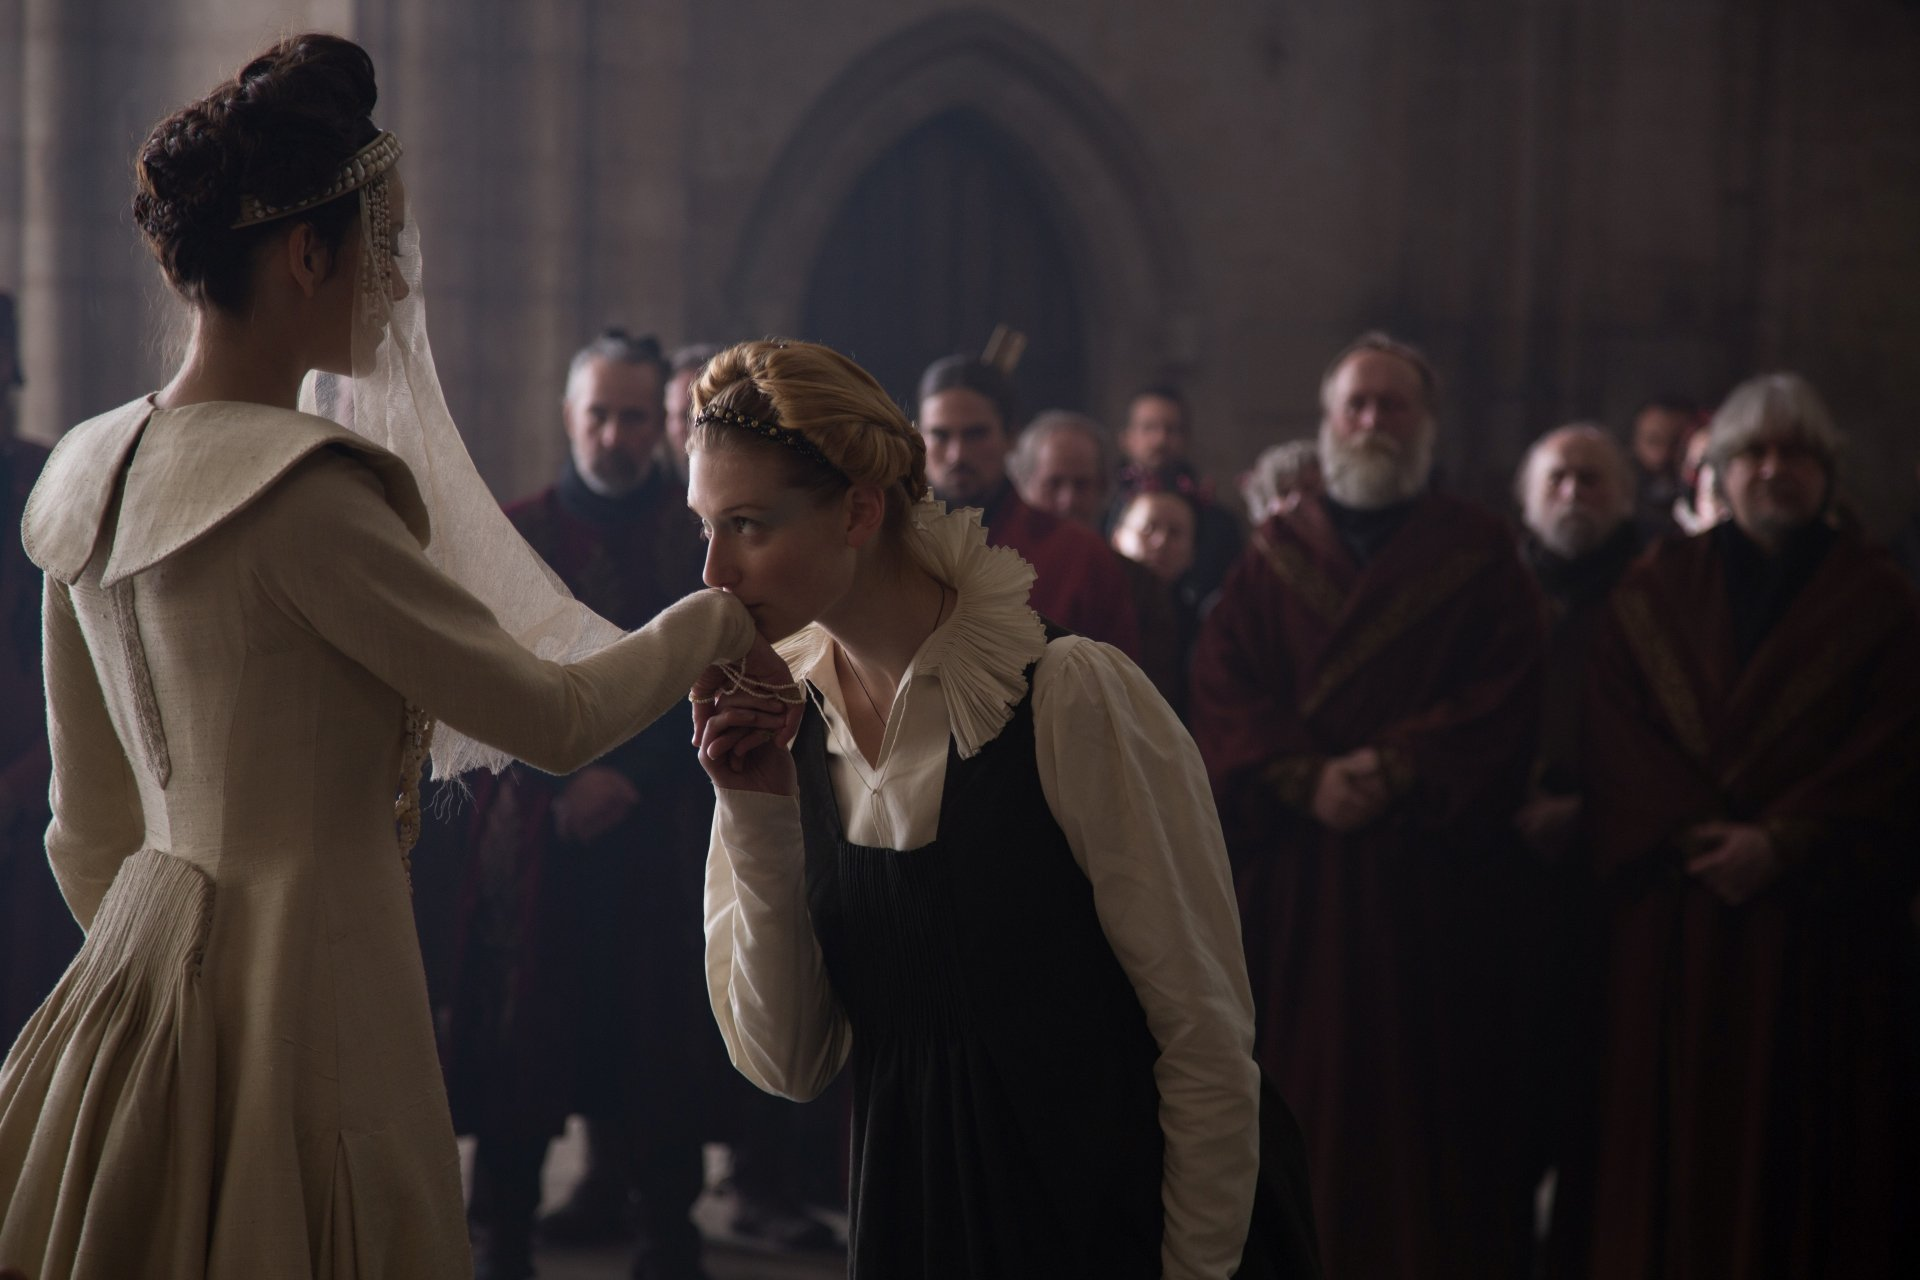 Movie - Macbeth  Lady Macbeth Marion Cotillard Lady Macduff Elizabeth Debicki Wallpaper